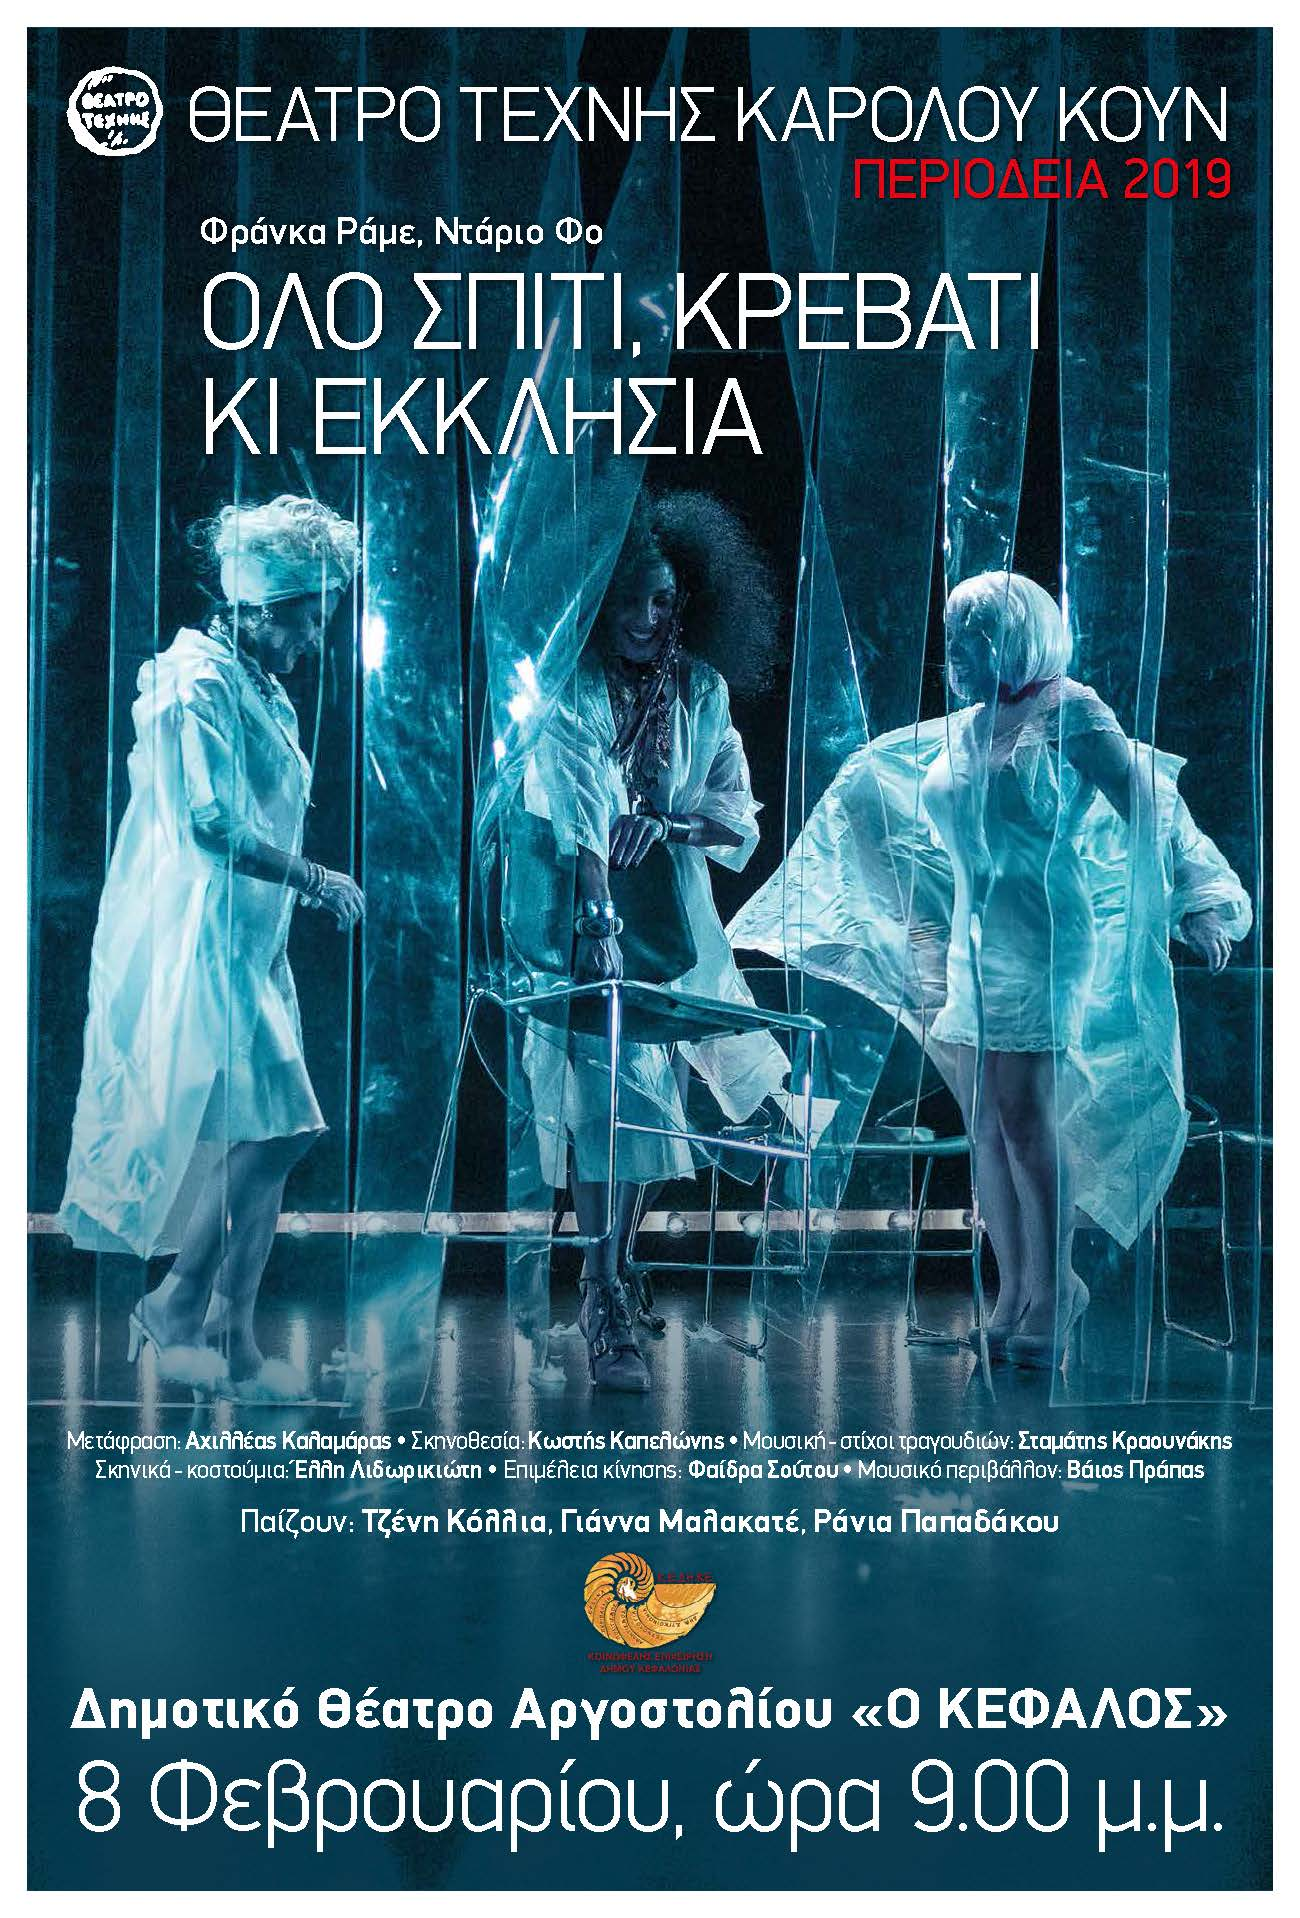 Poster Olo Spiti Kefallonia